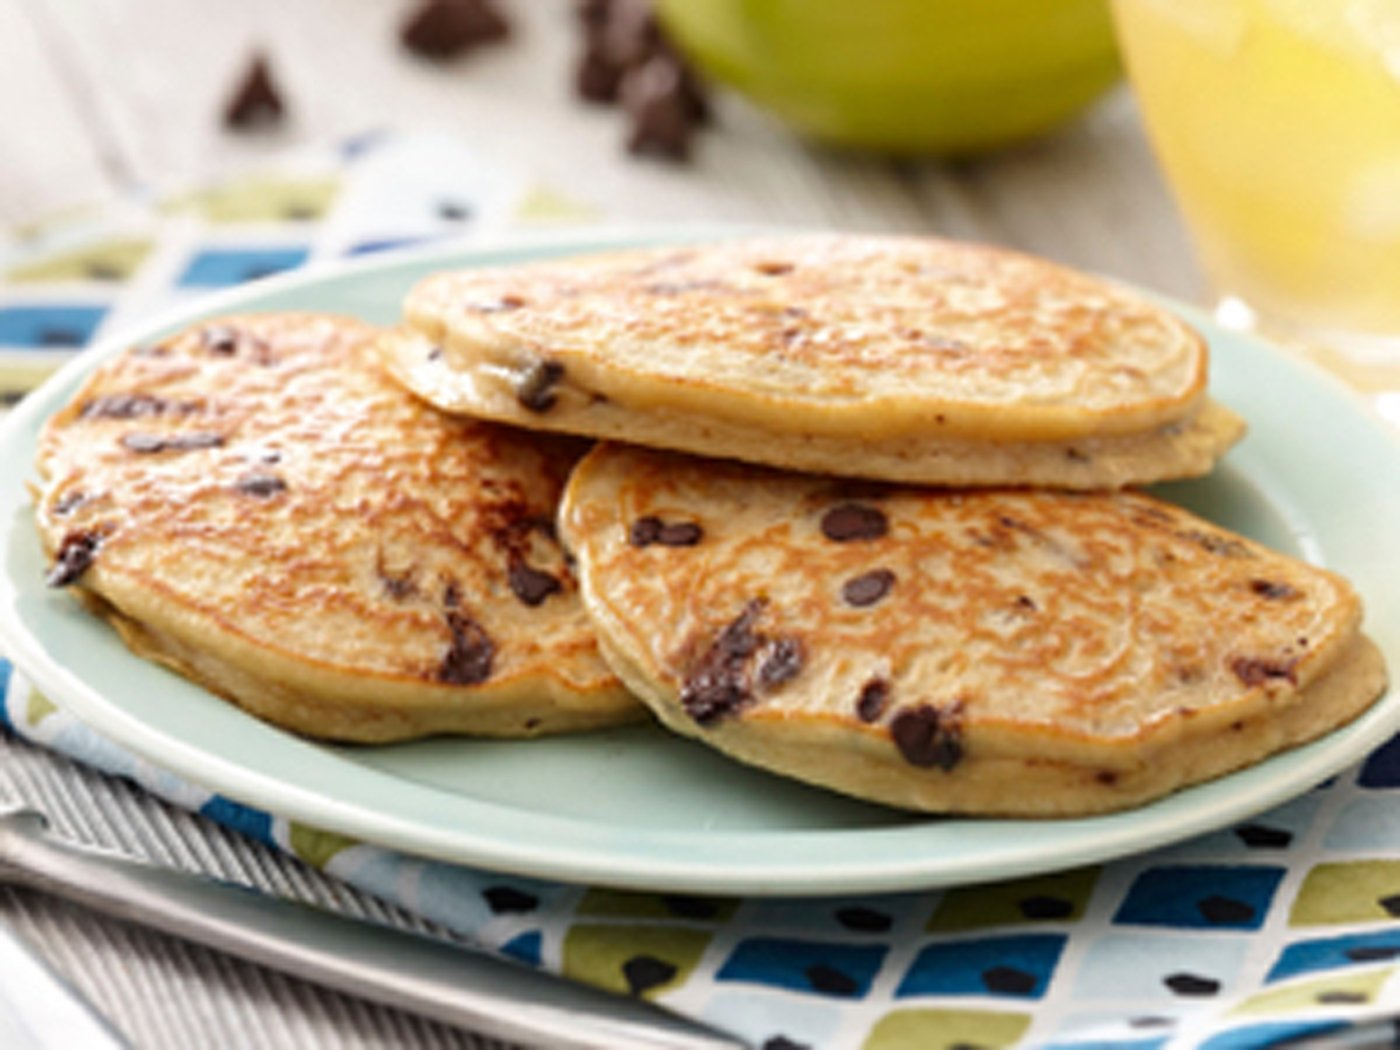 Amazon.com: Medifast Chocolate Chip Pancakes (1 Box 7 Servings ...